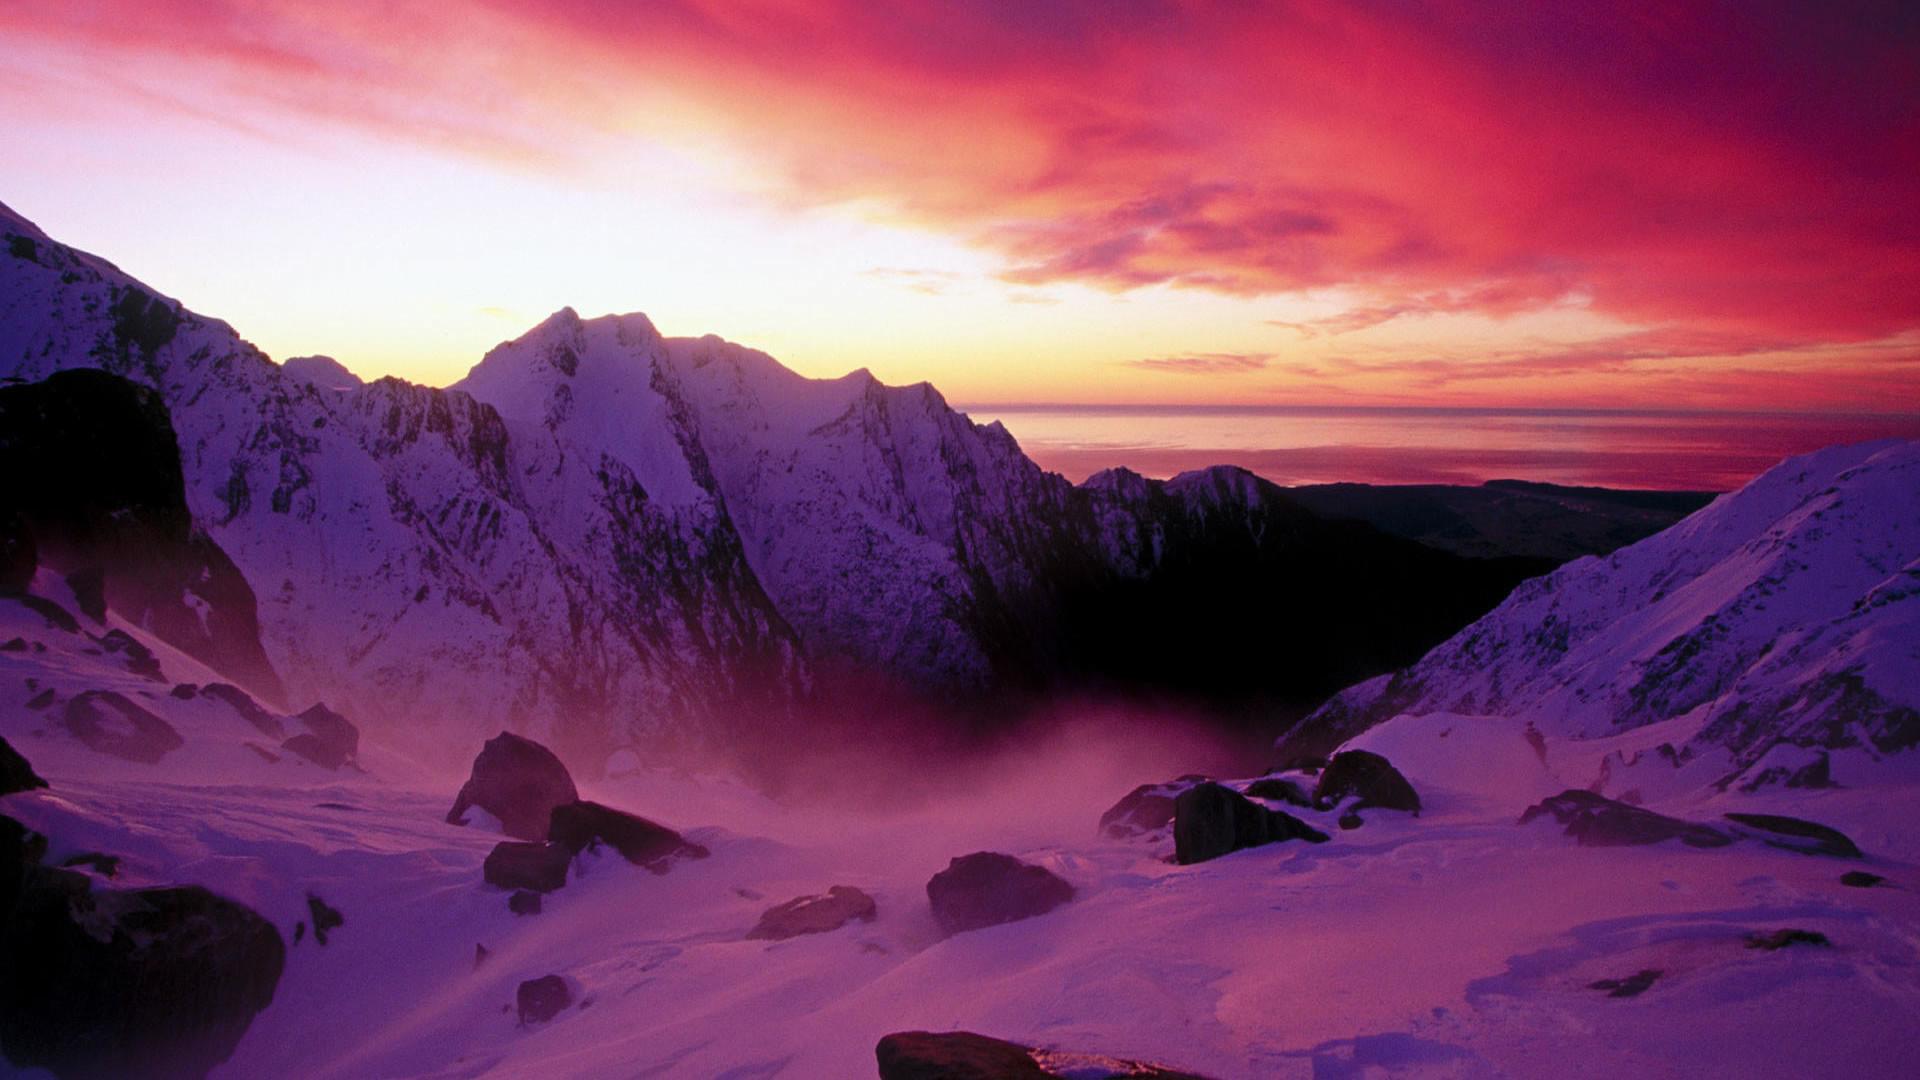 Desktop Backgrounds Mountains Wallpapertag